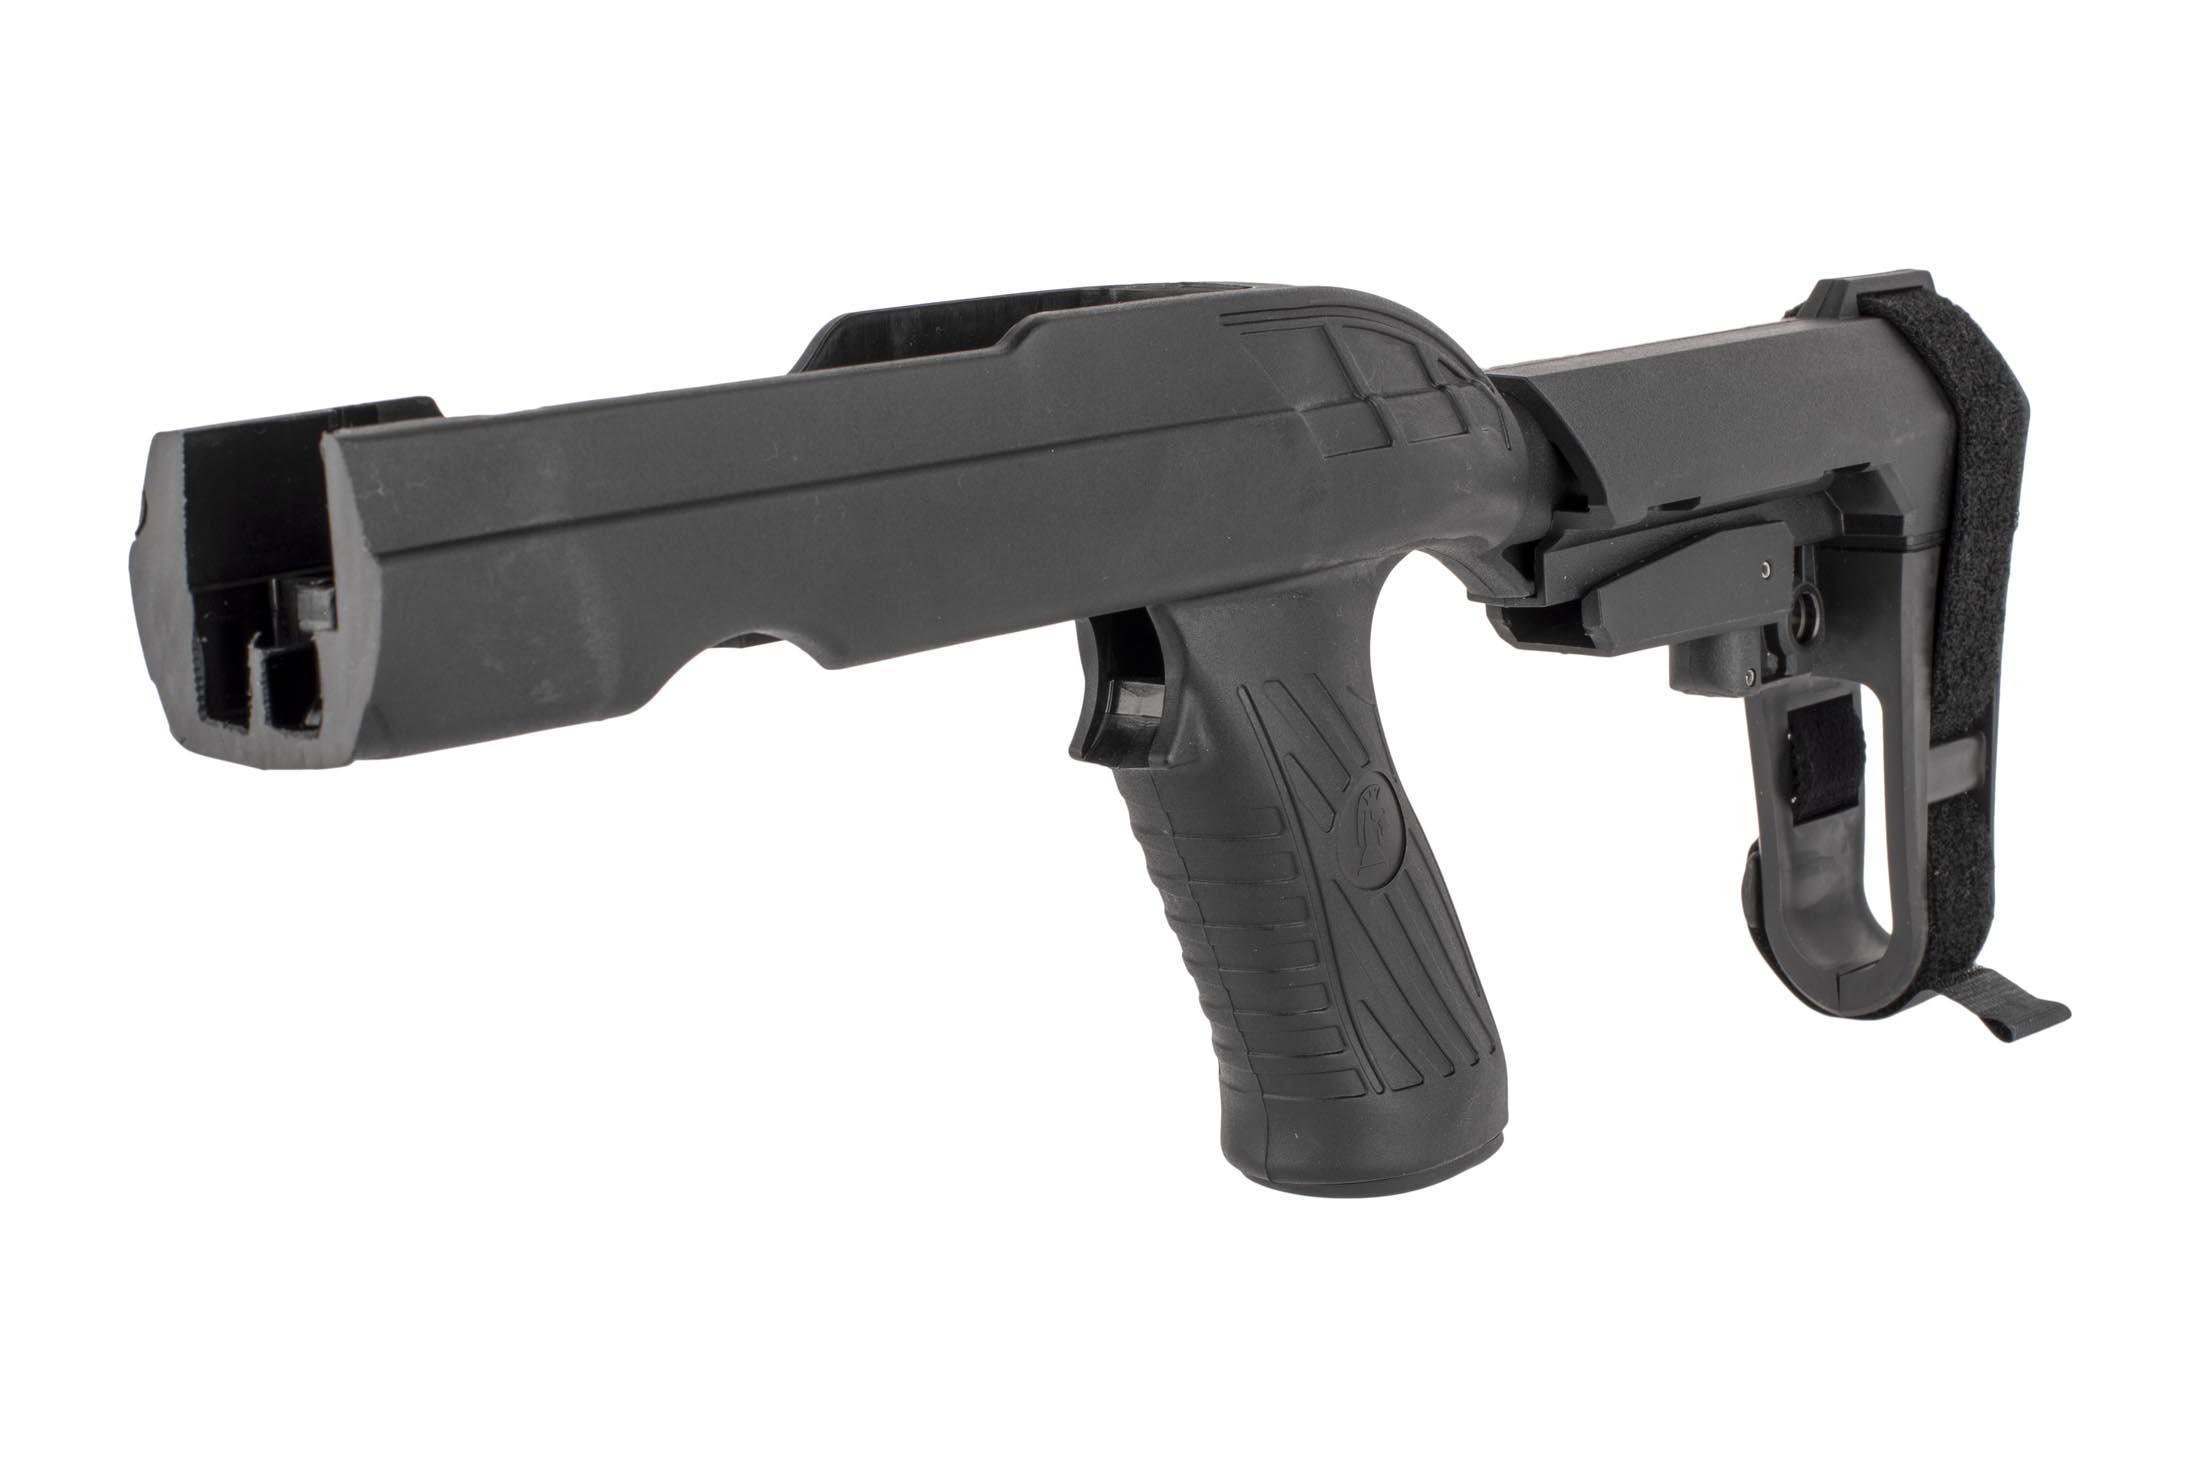 Sb Tactical Sba3 Charger Td Stabilizing Brace Kit 1022a3 01 Sb